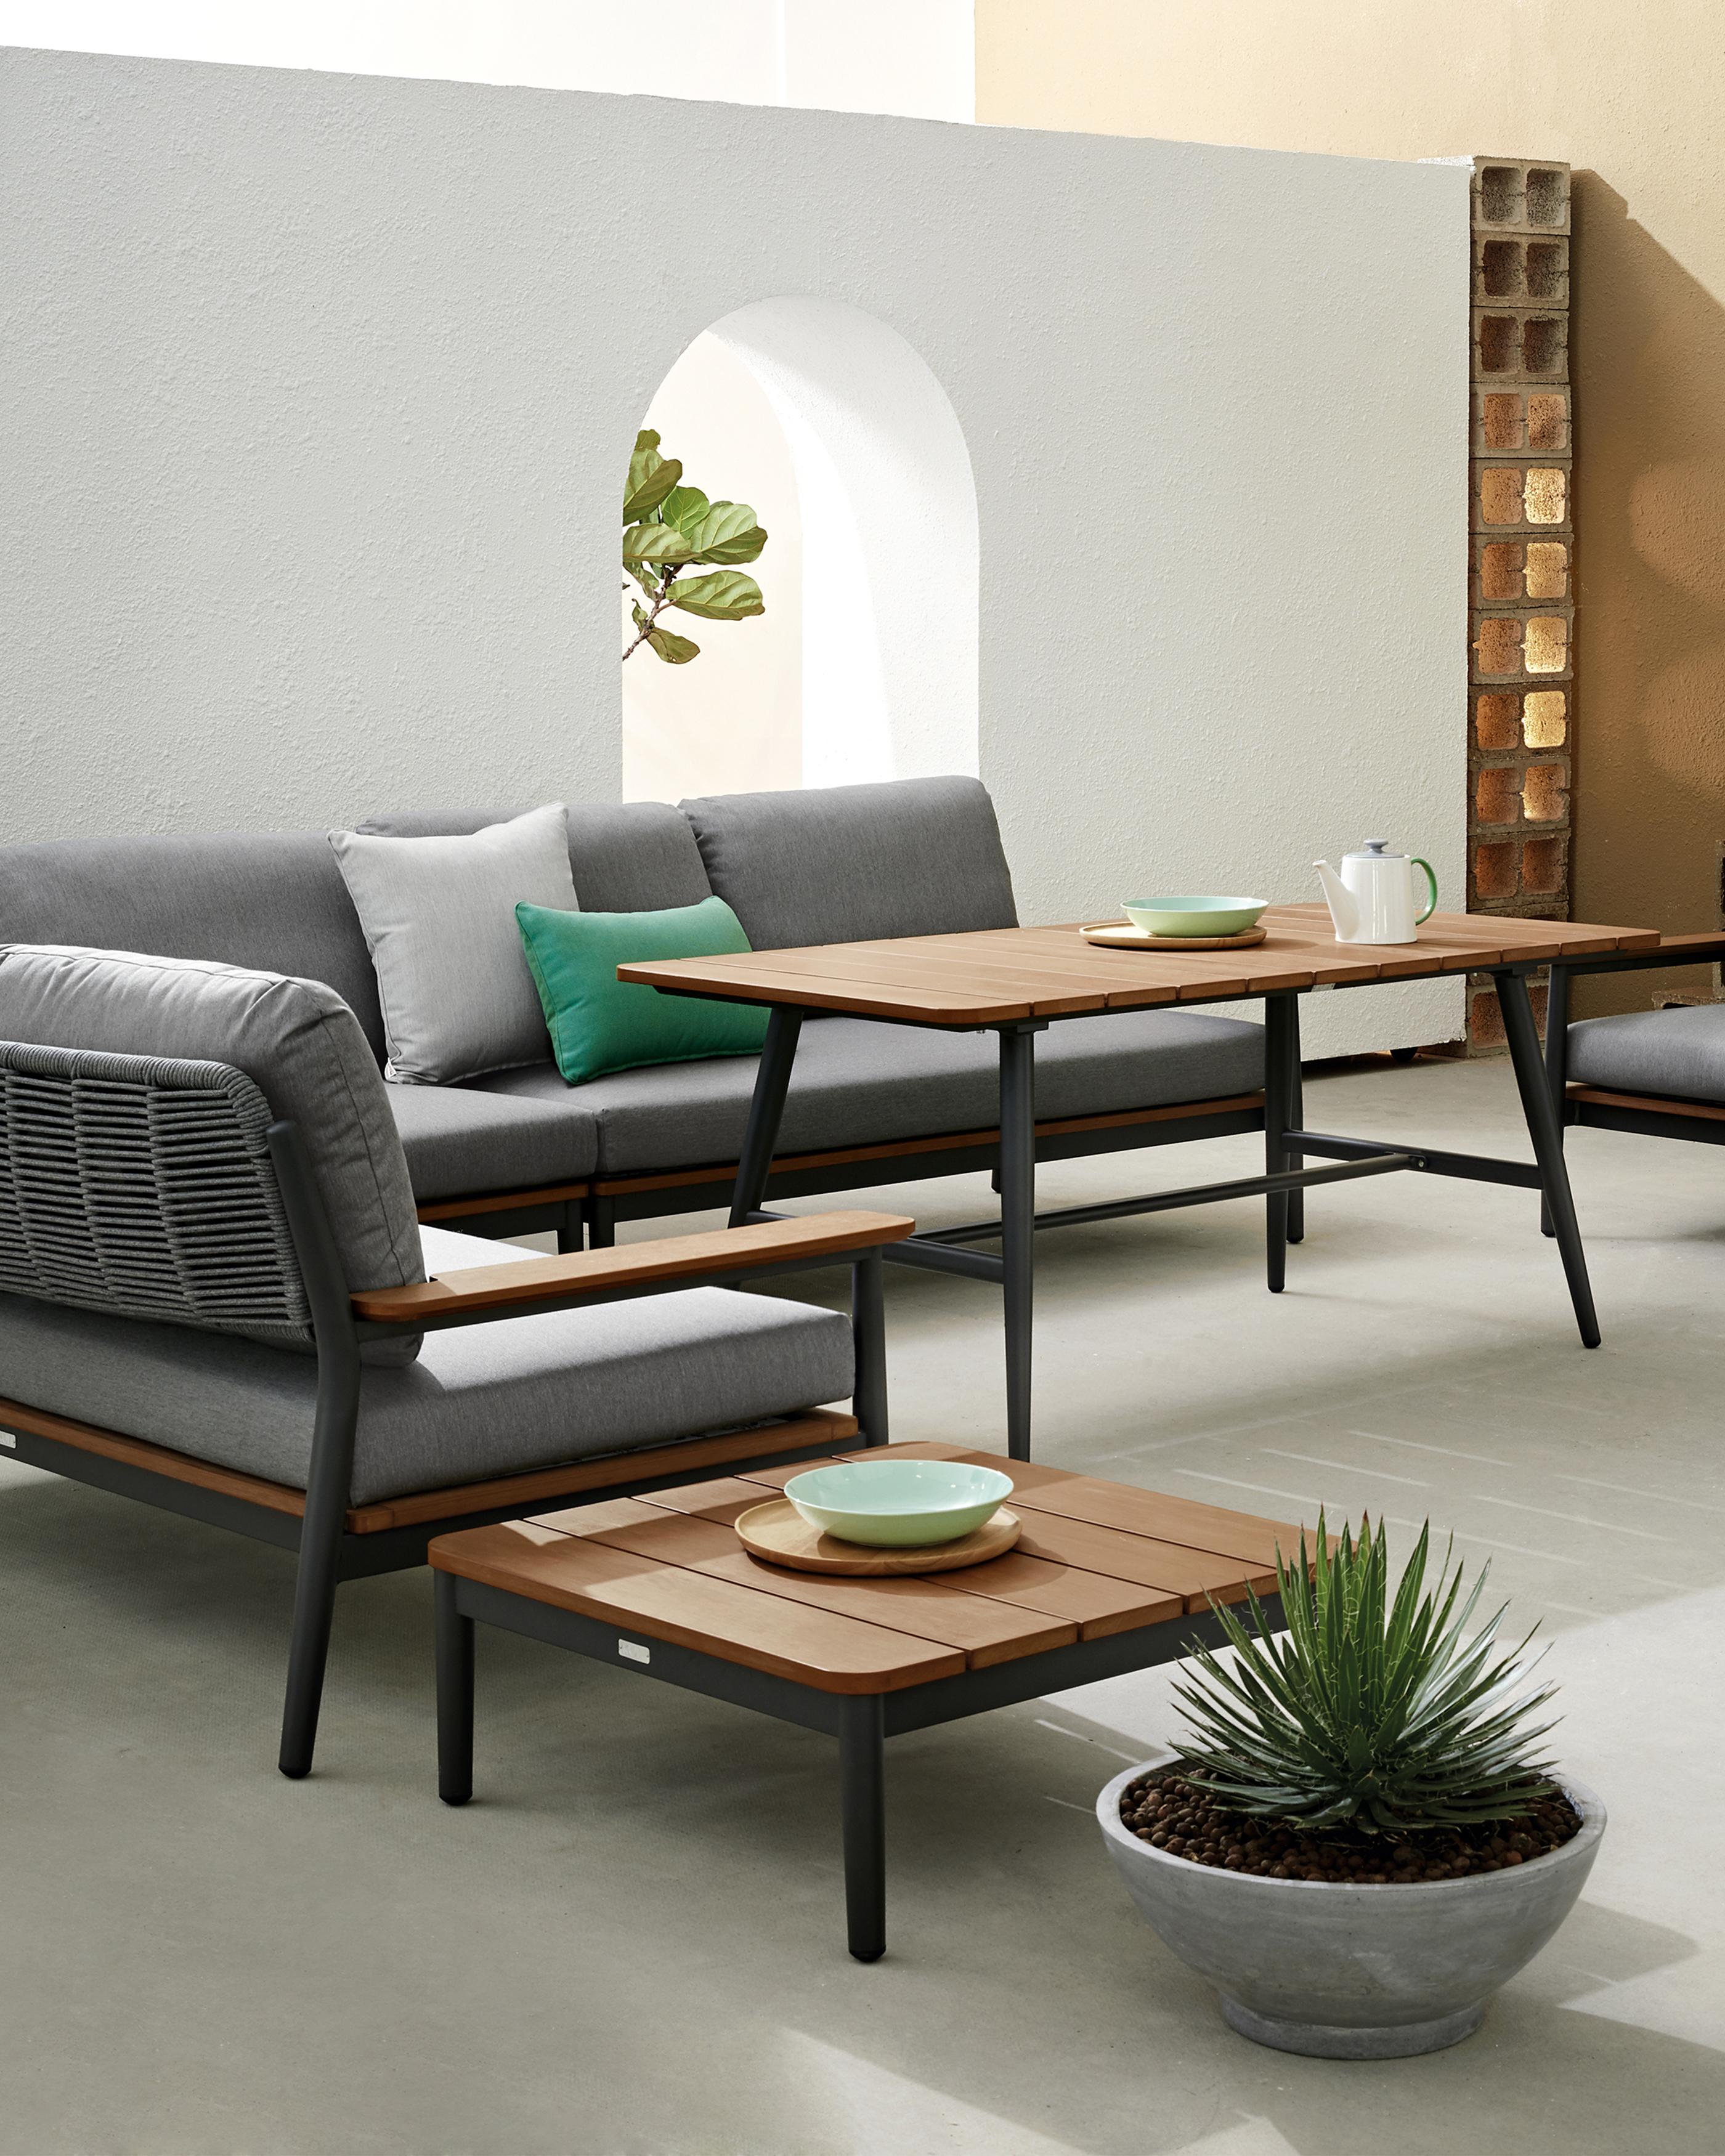 kundesign furniture company | ICFF